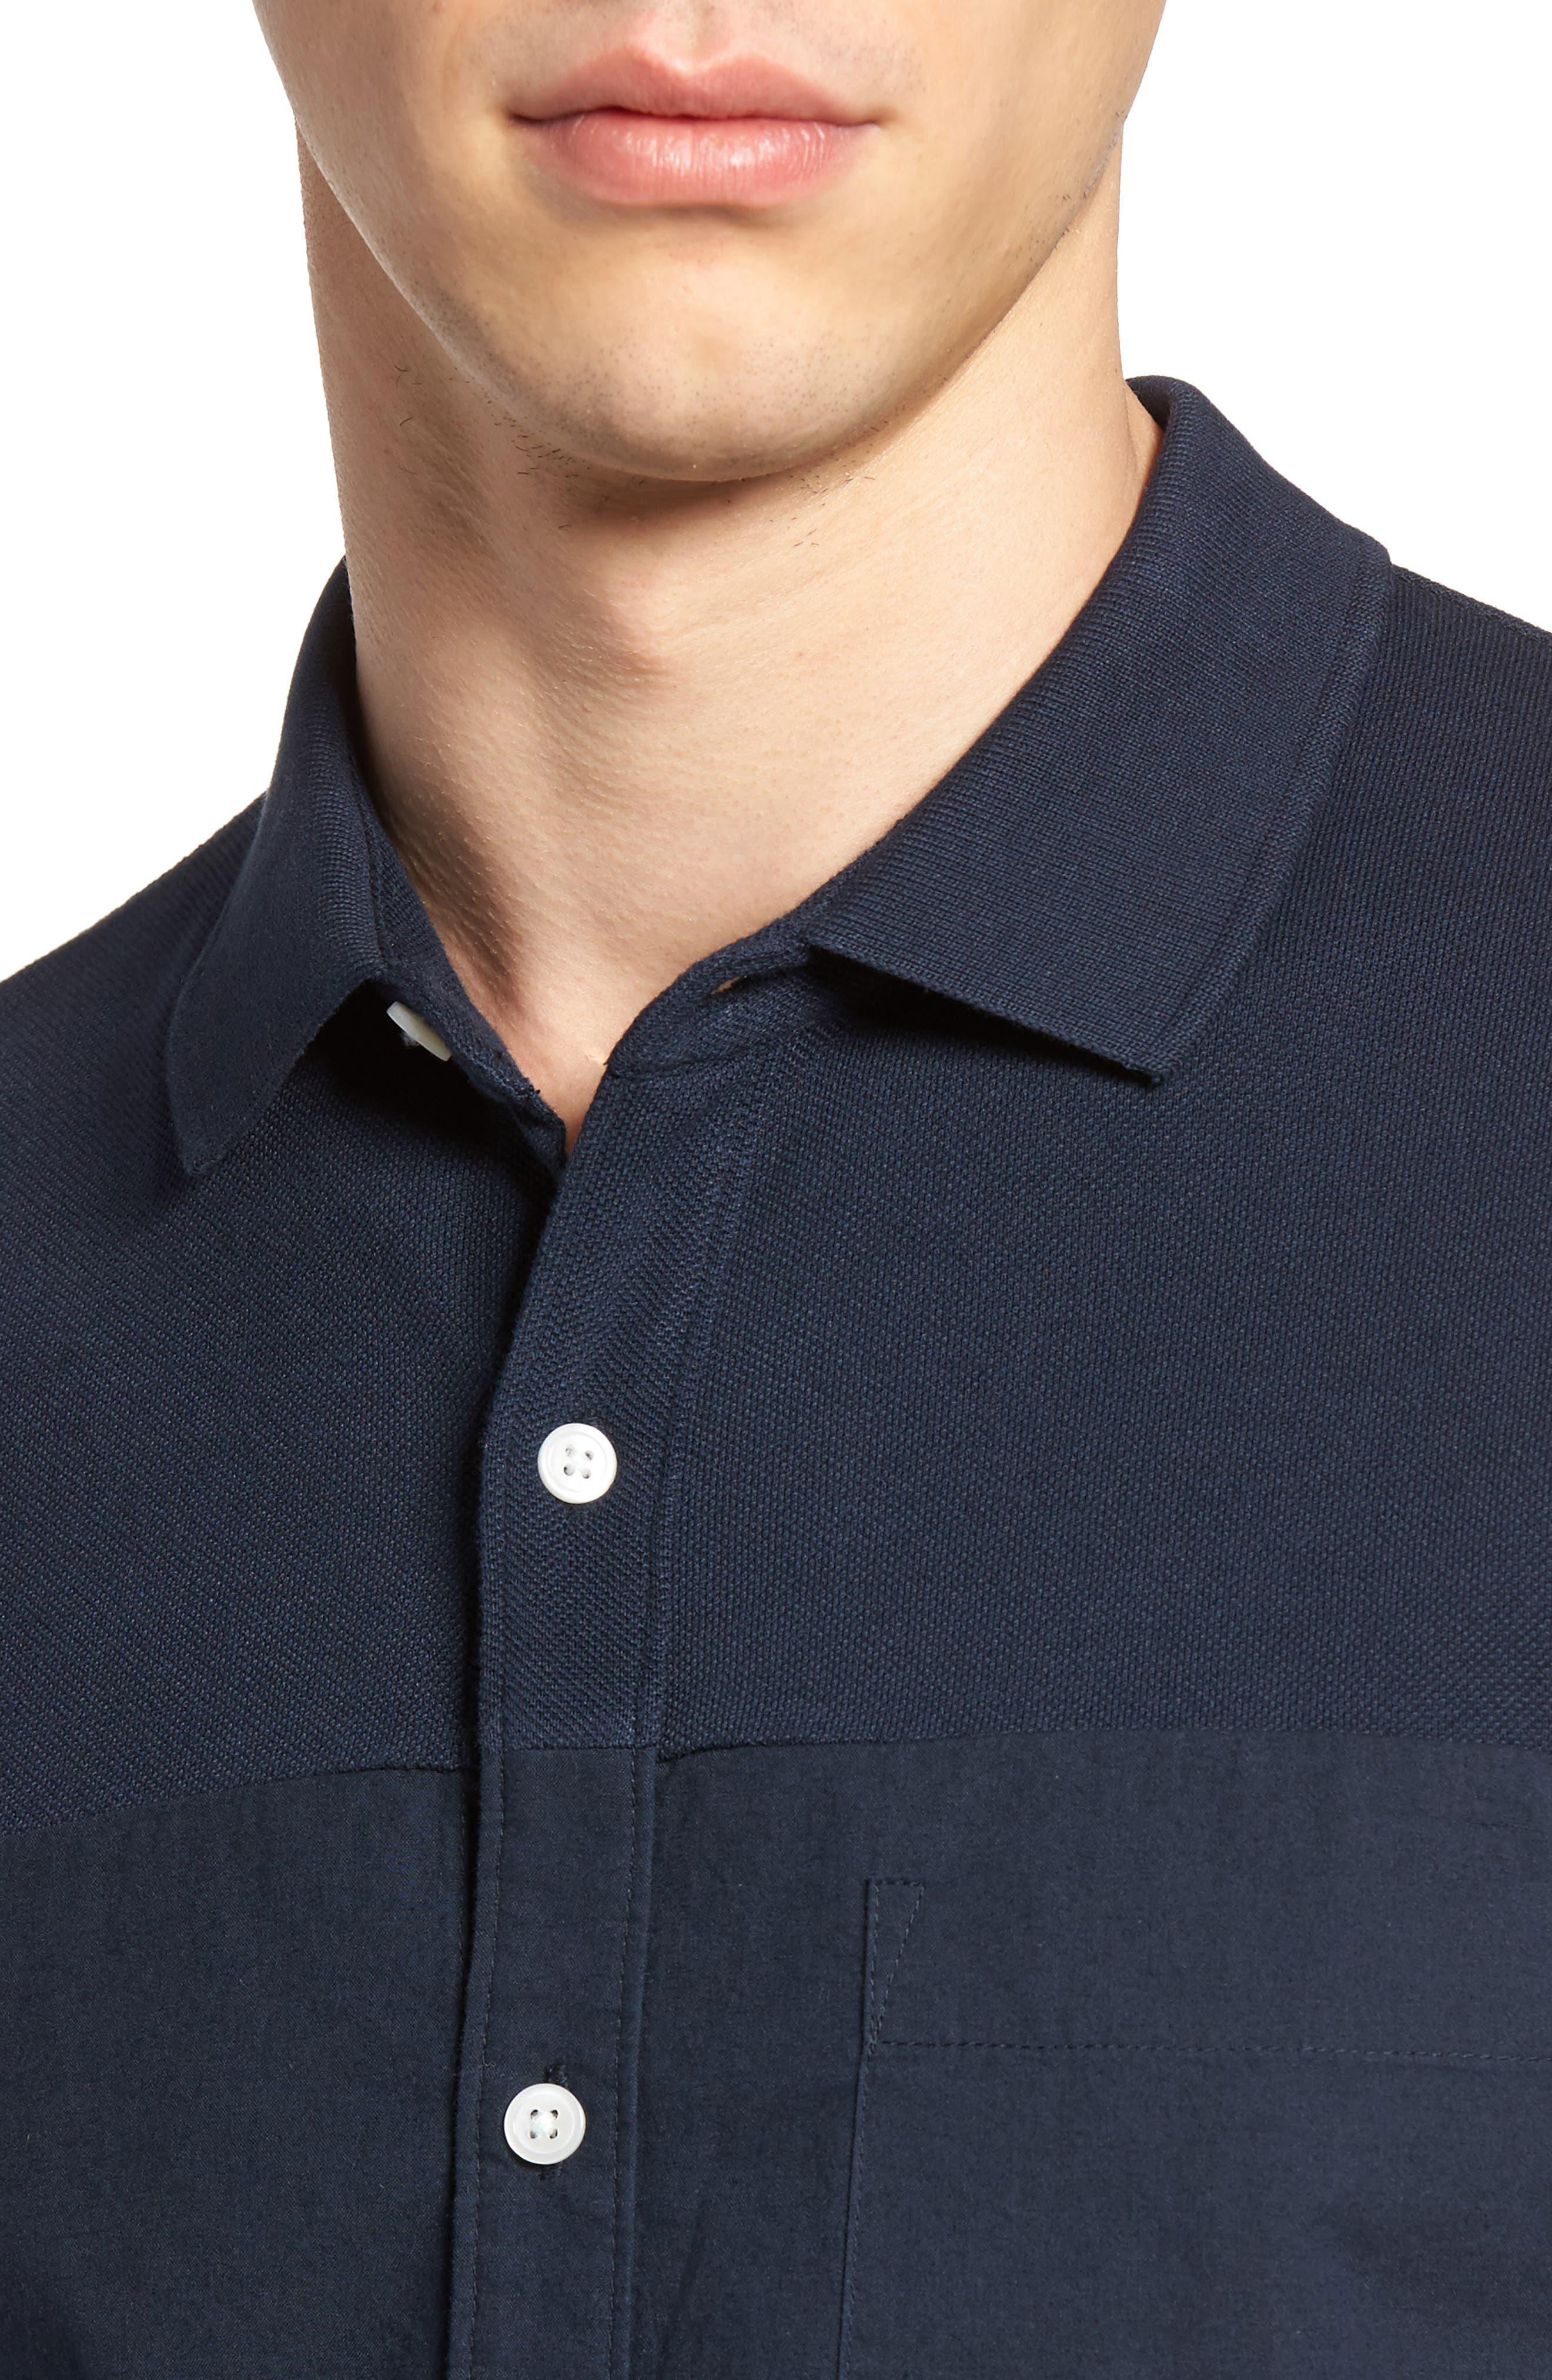 Slim Fit Short Sleeve Sport Shirt,                             Alternate thumbnail 2, color,                             Marine Blue